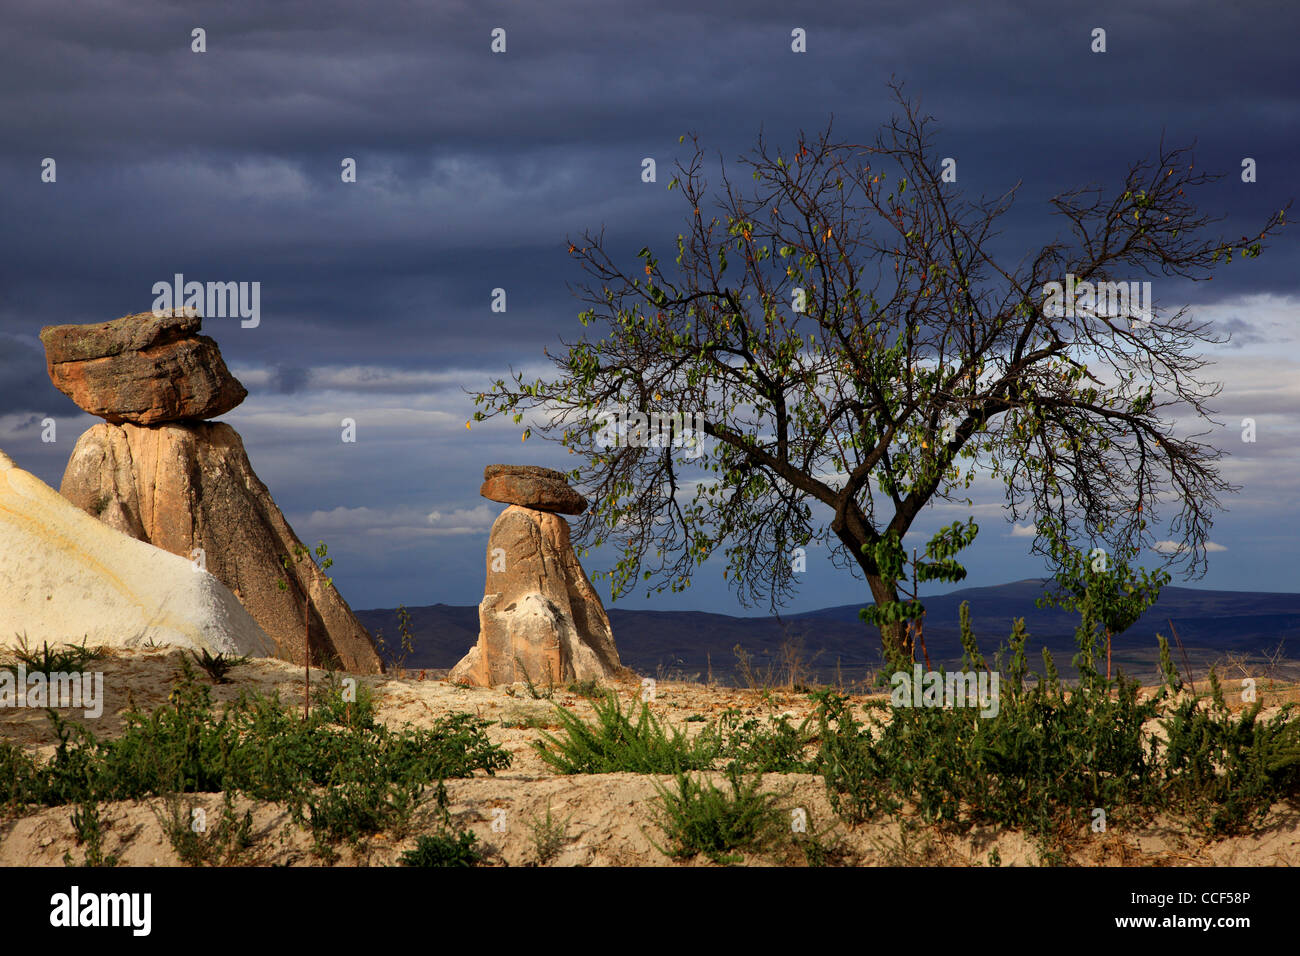 Típico paisaje Cappadocian, cerca de Urgup, en la carretera de Goreme. Nevsehir, Anatolia, Turquía Imagen De Stock